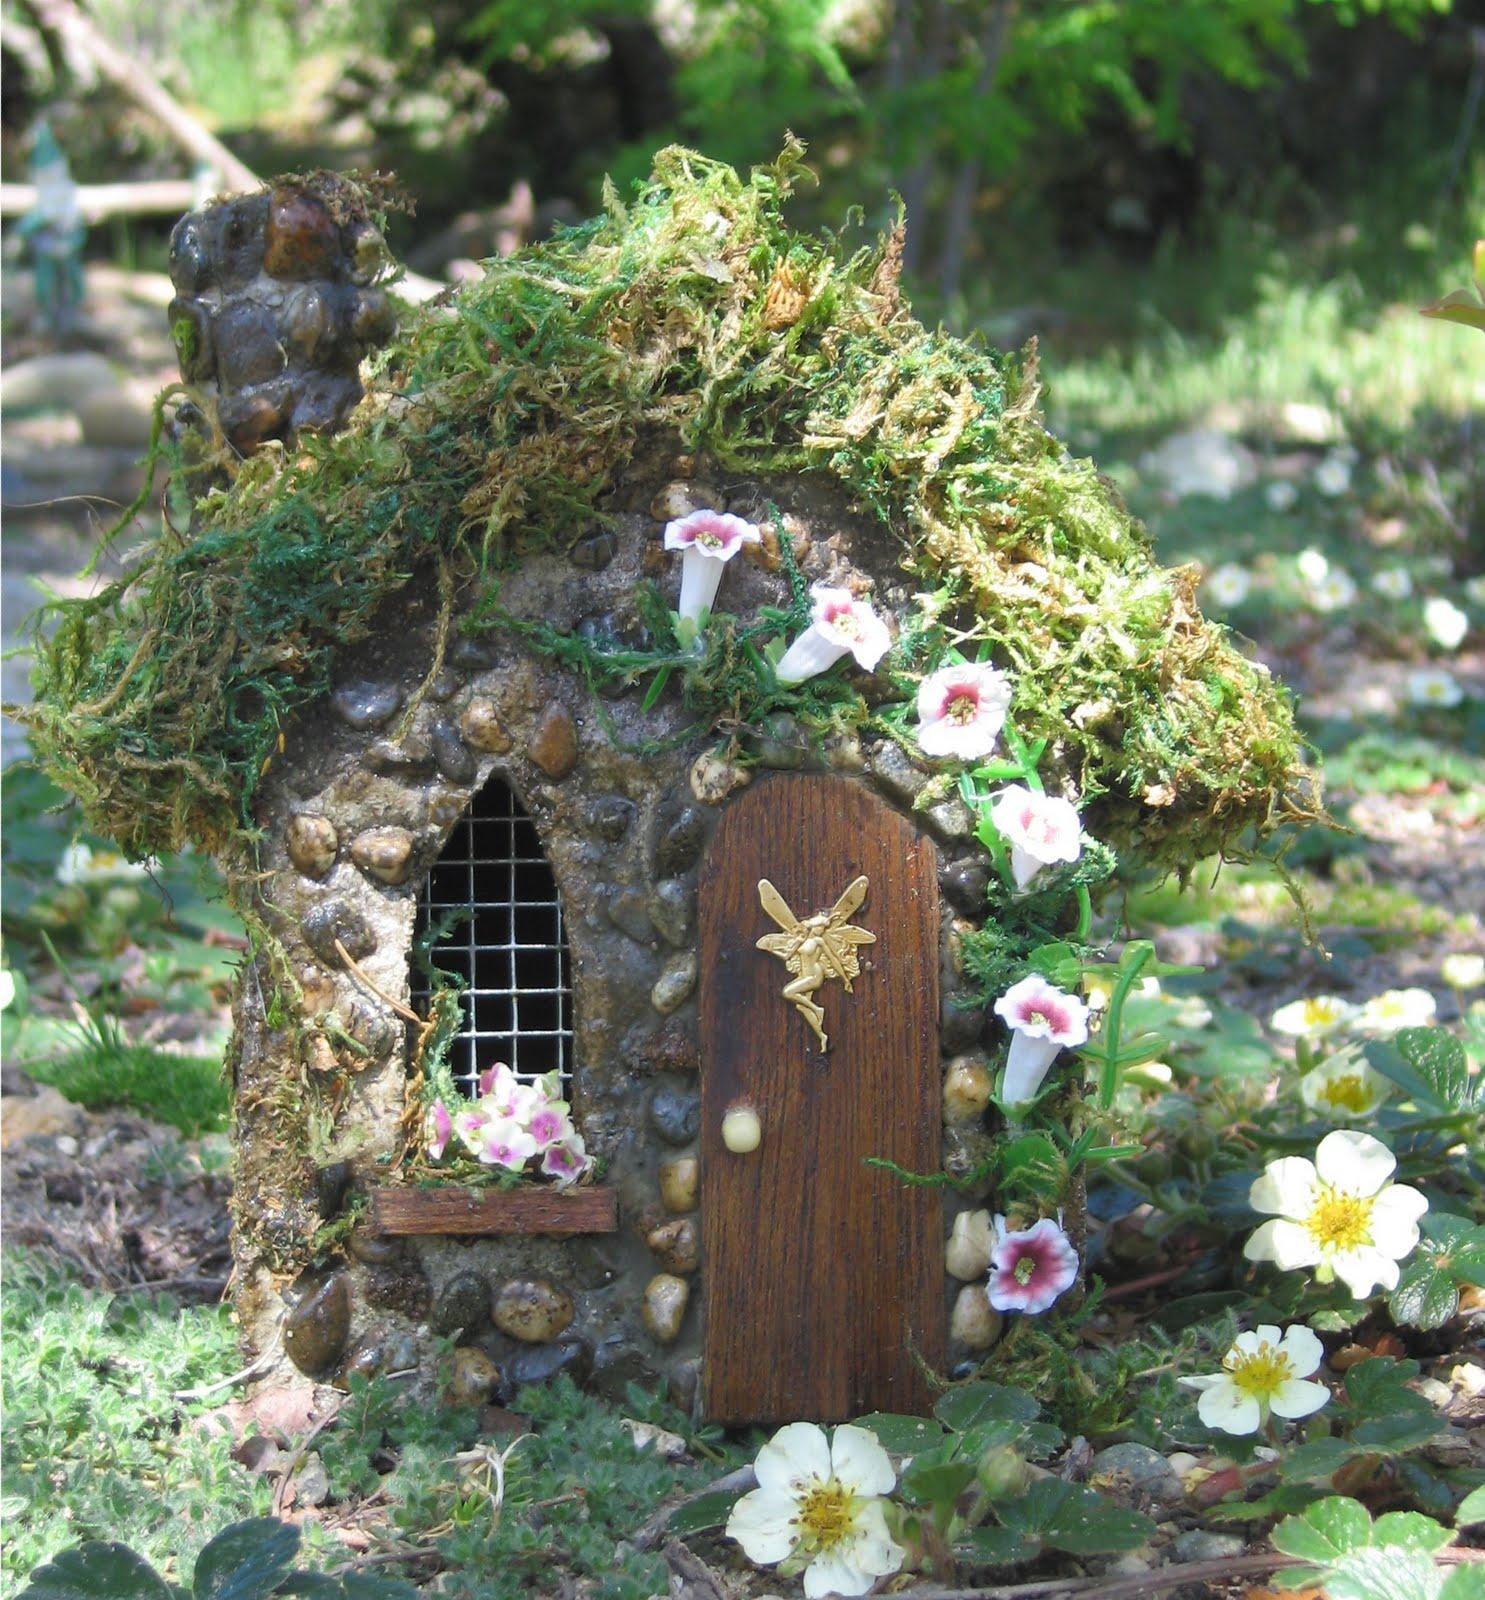 Enchanted Garden: Home Musings: June 2010